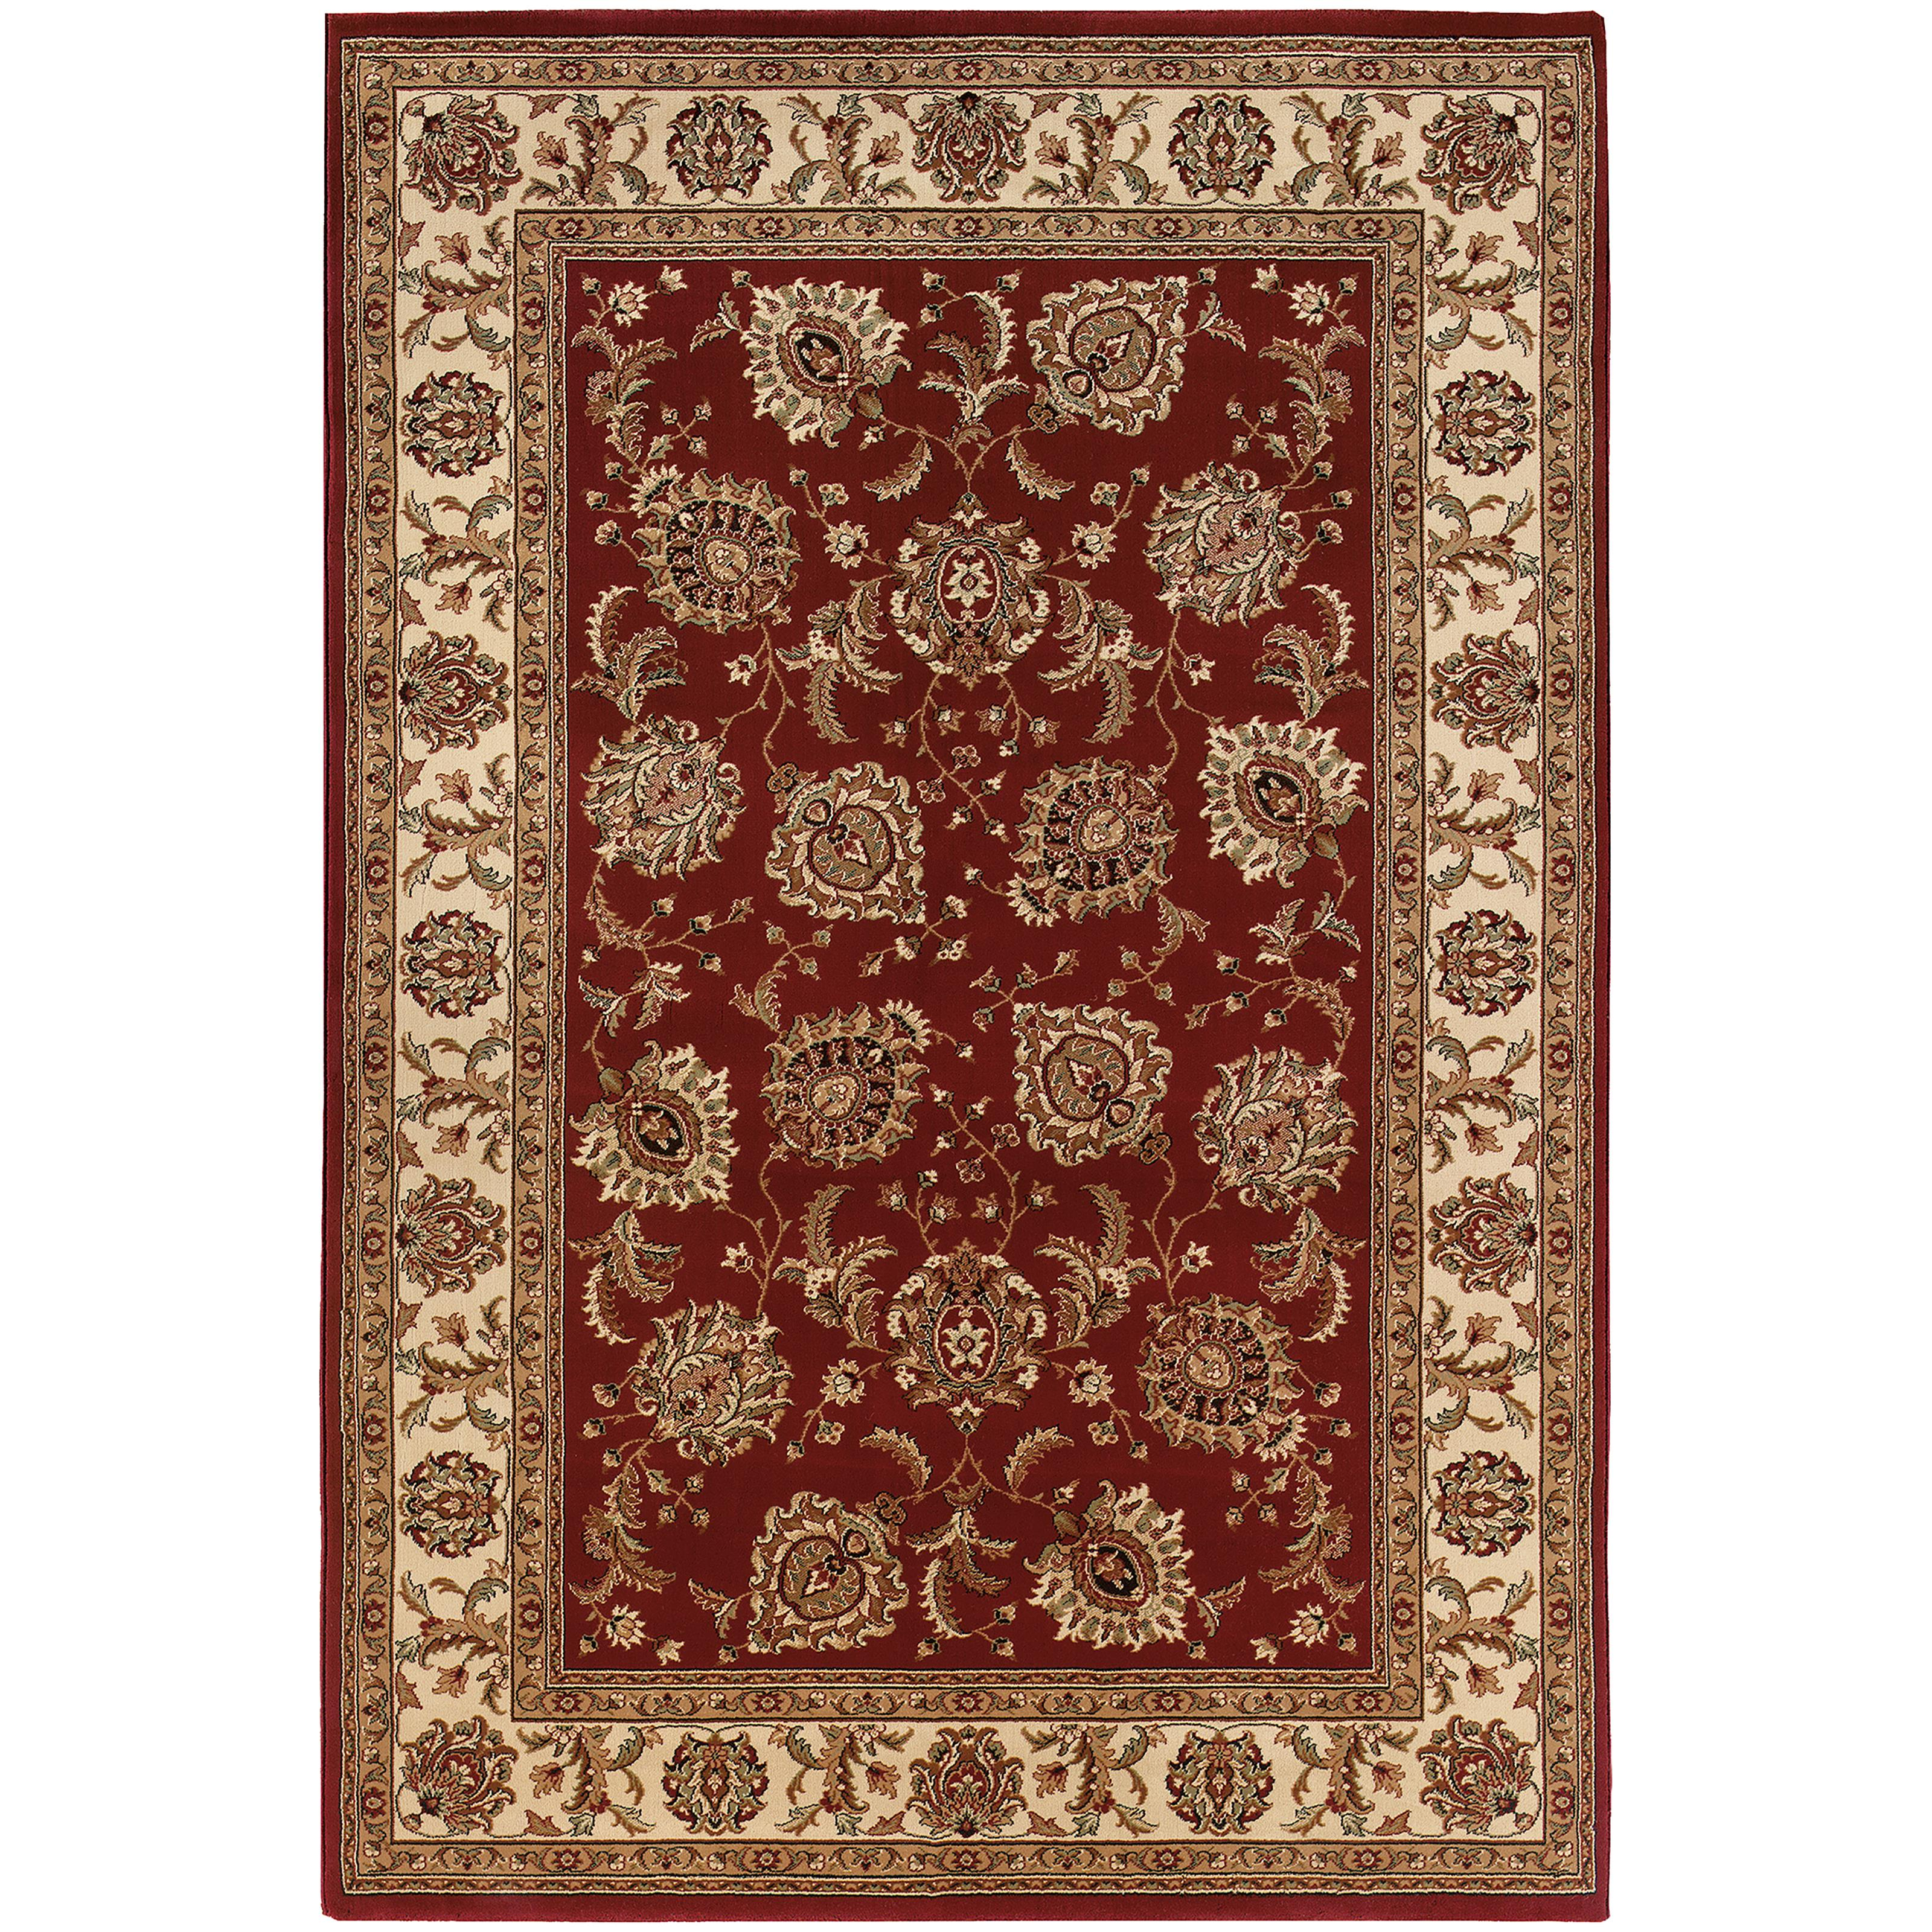 Oriental Weavers Ariana 12' X 15' Rug - Item Number: A117C3360450ST